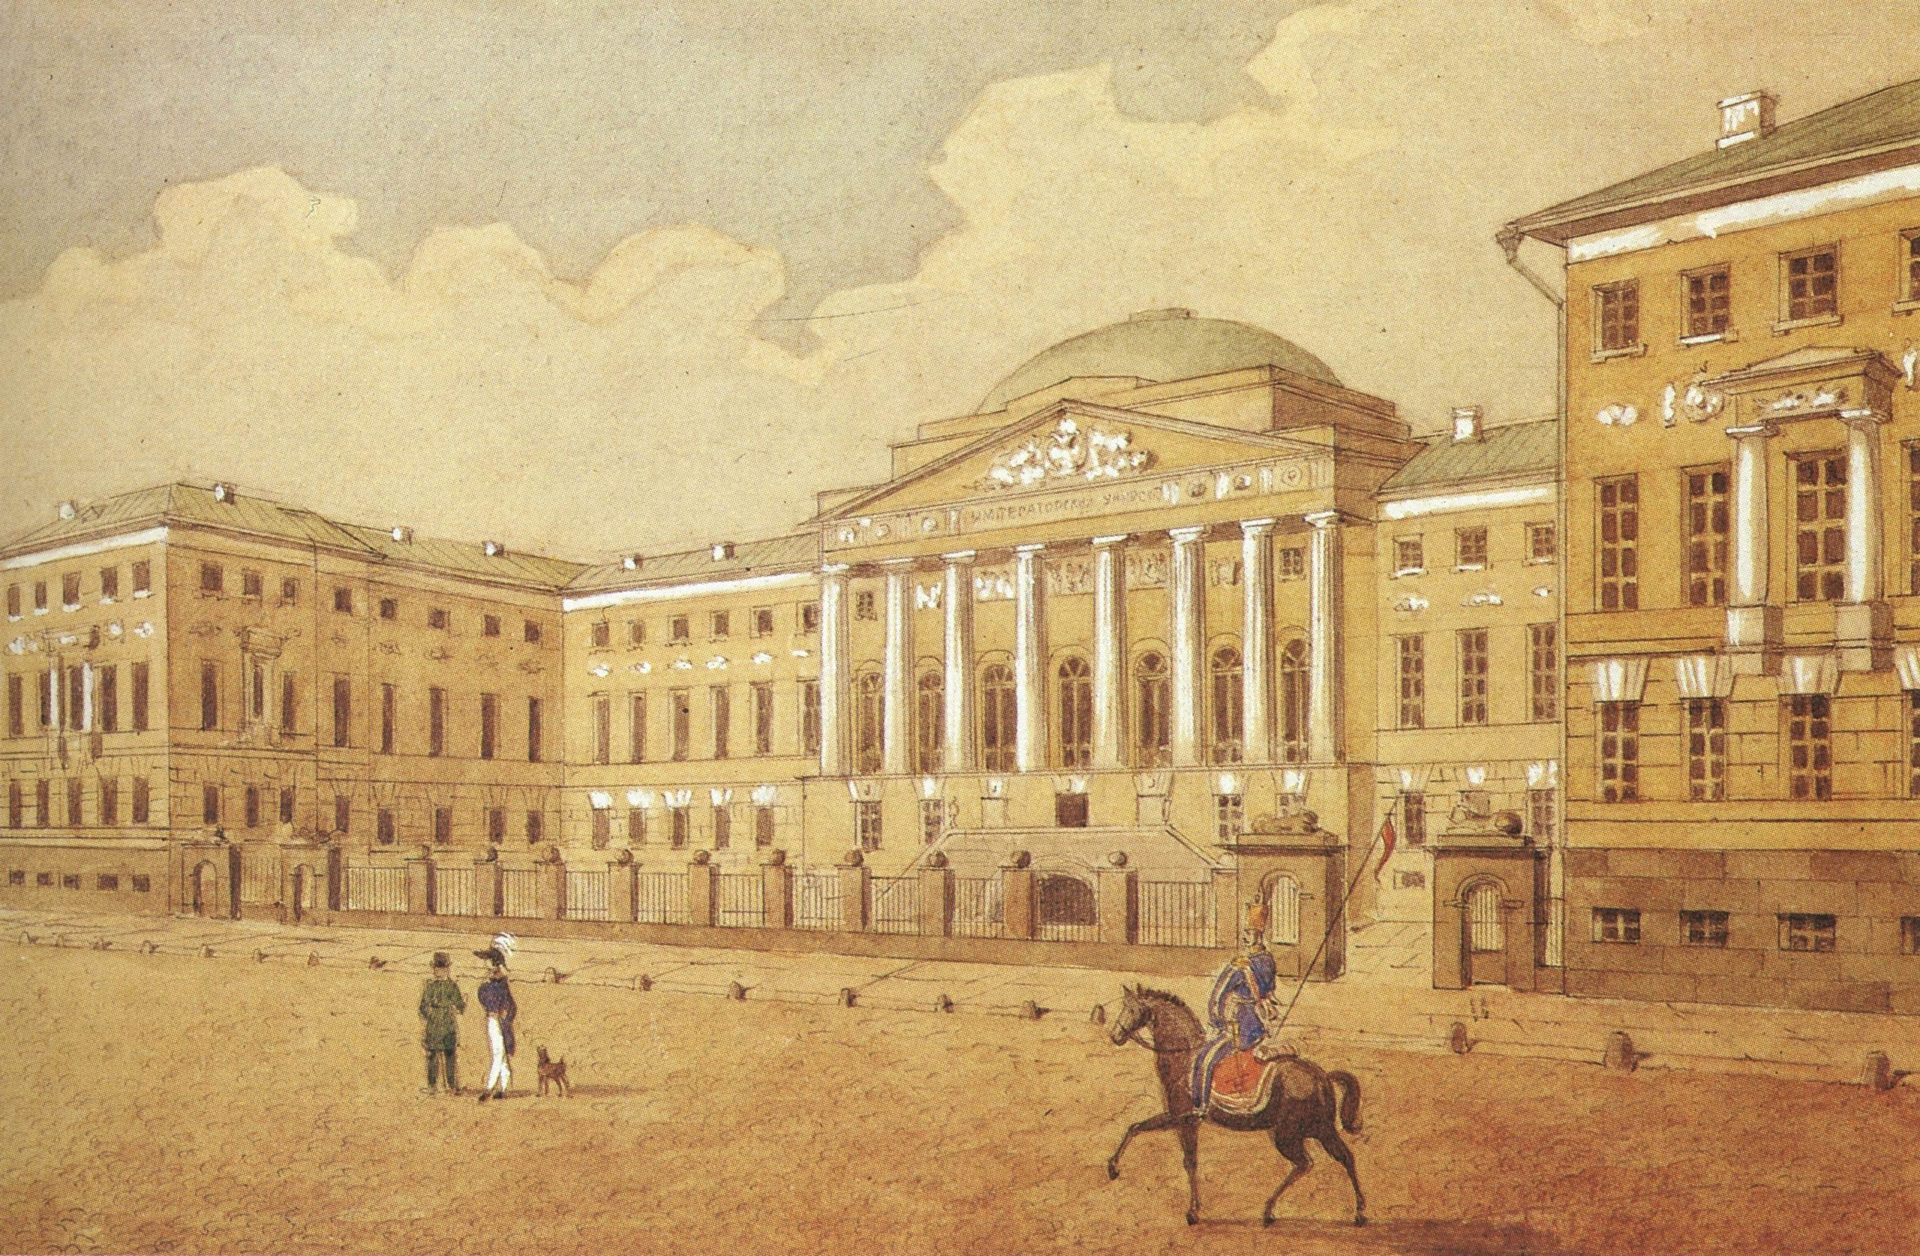 Moscow State Lomonosov University Old